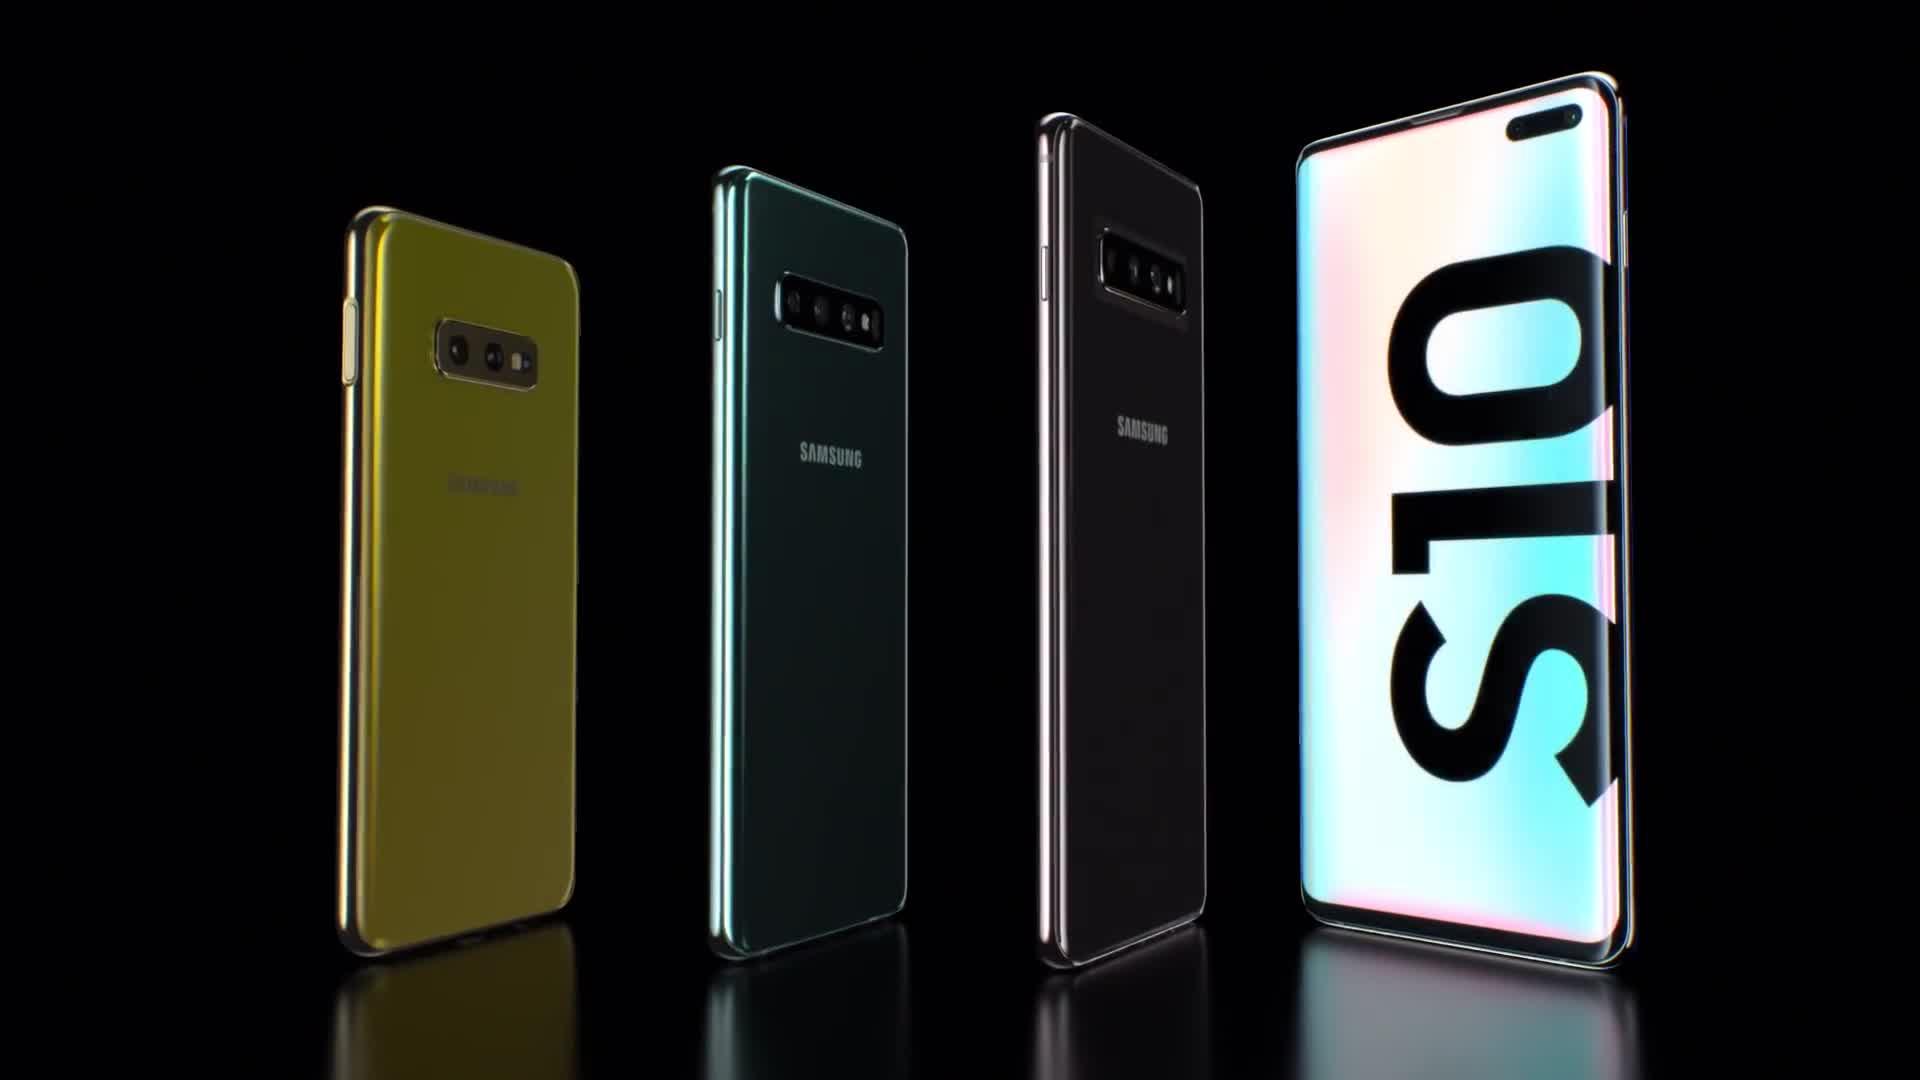 Smartphone, Android, Samsung, Galaxy, Samsung Galaxy, Samsung Mobile, Samsung Galaxy S10, Galaxy S10, S10